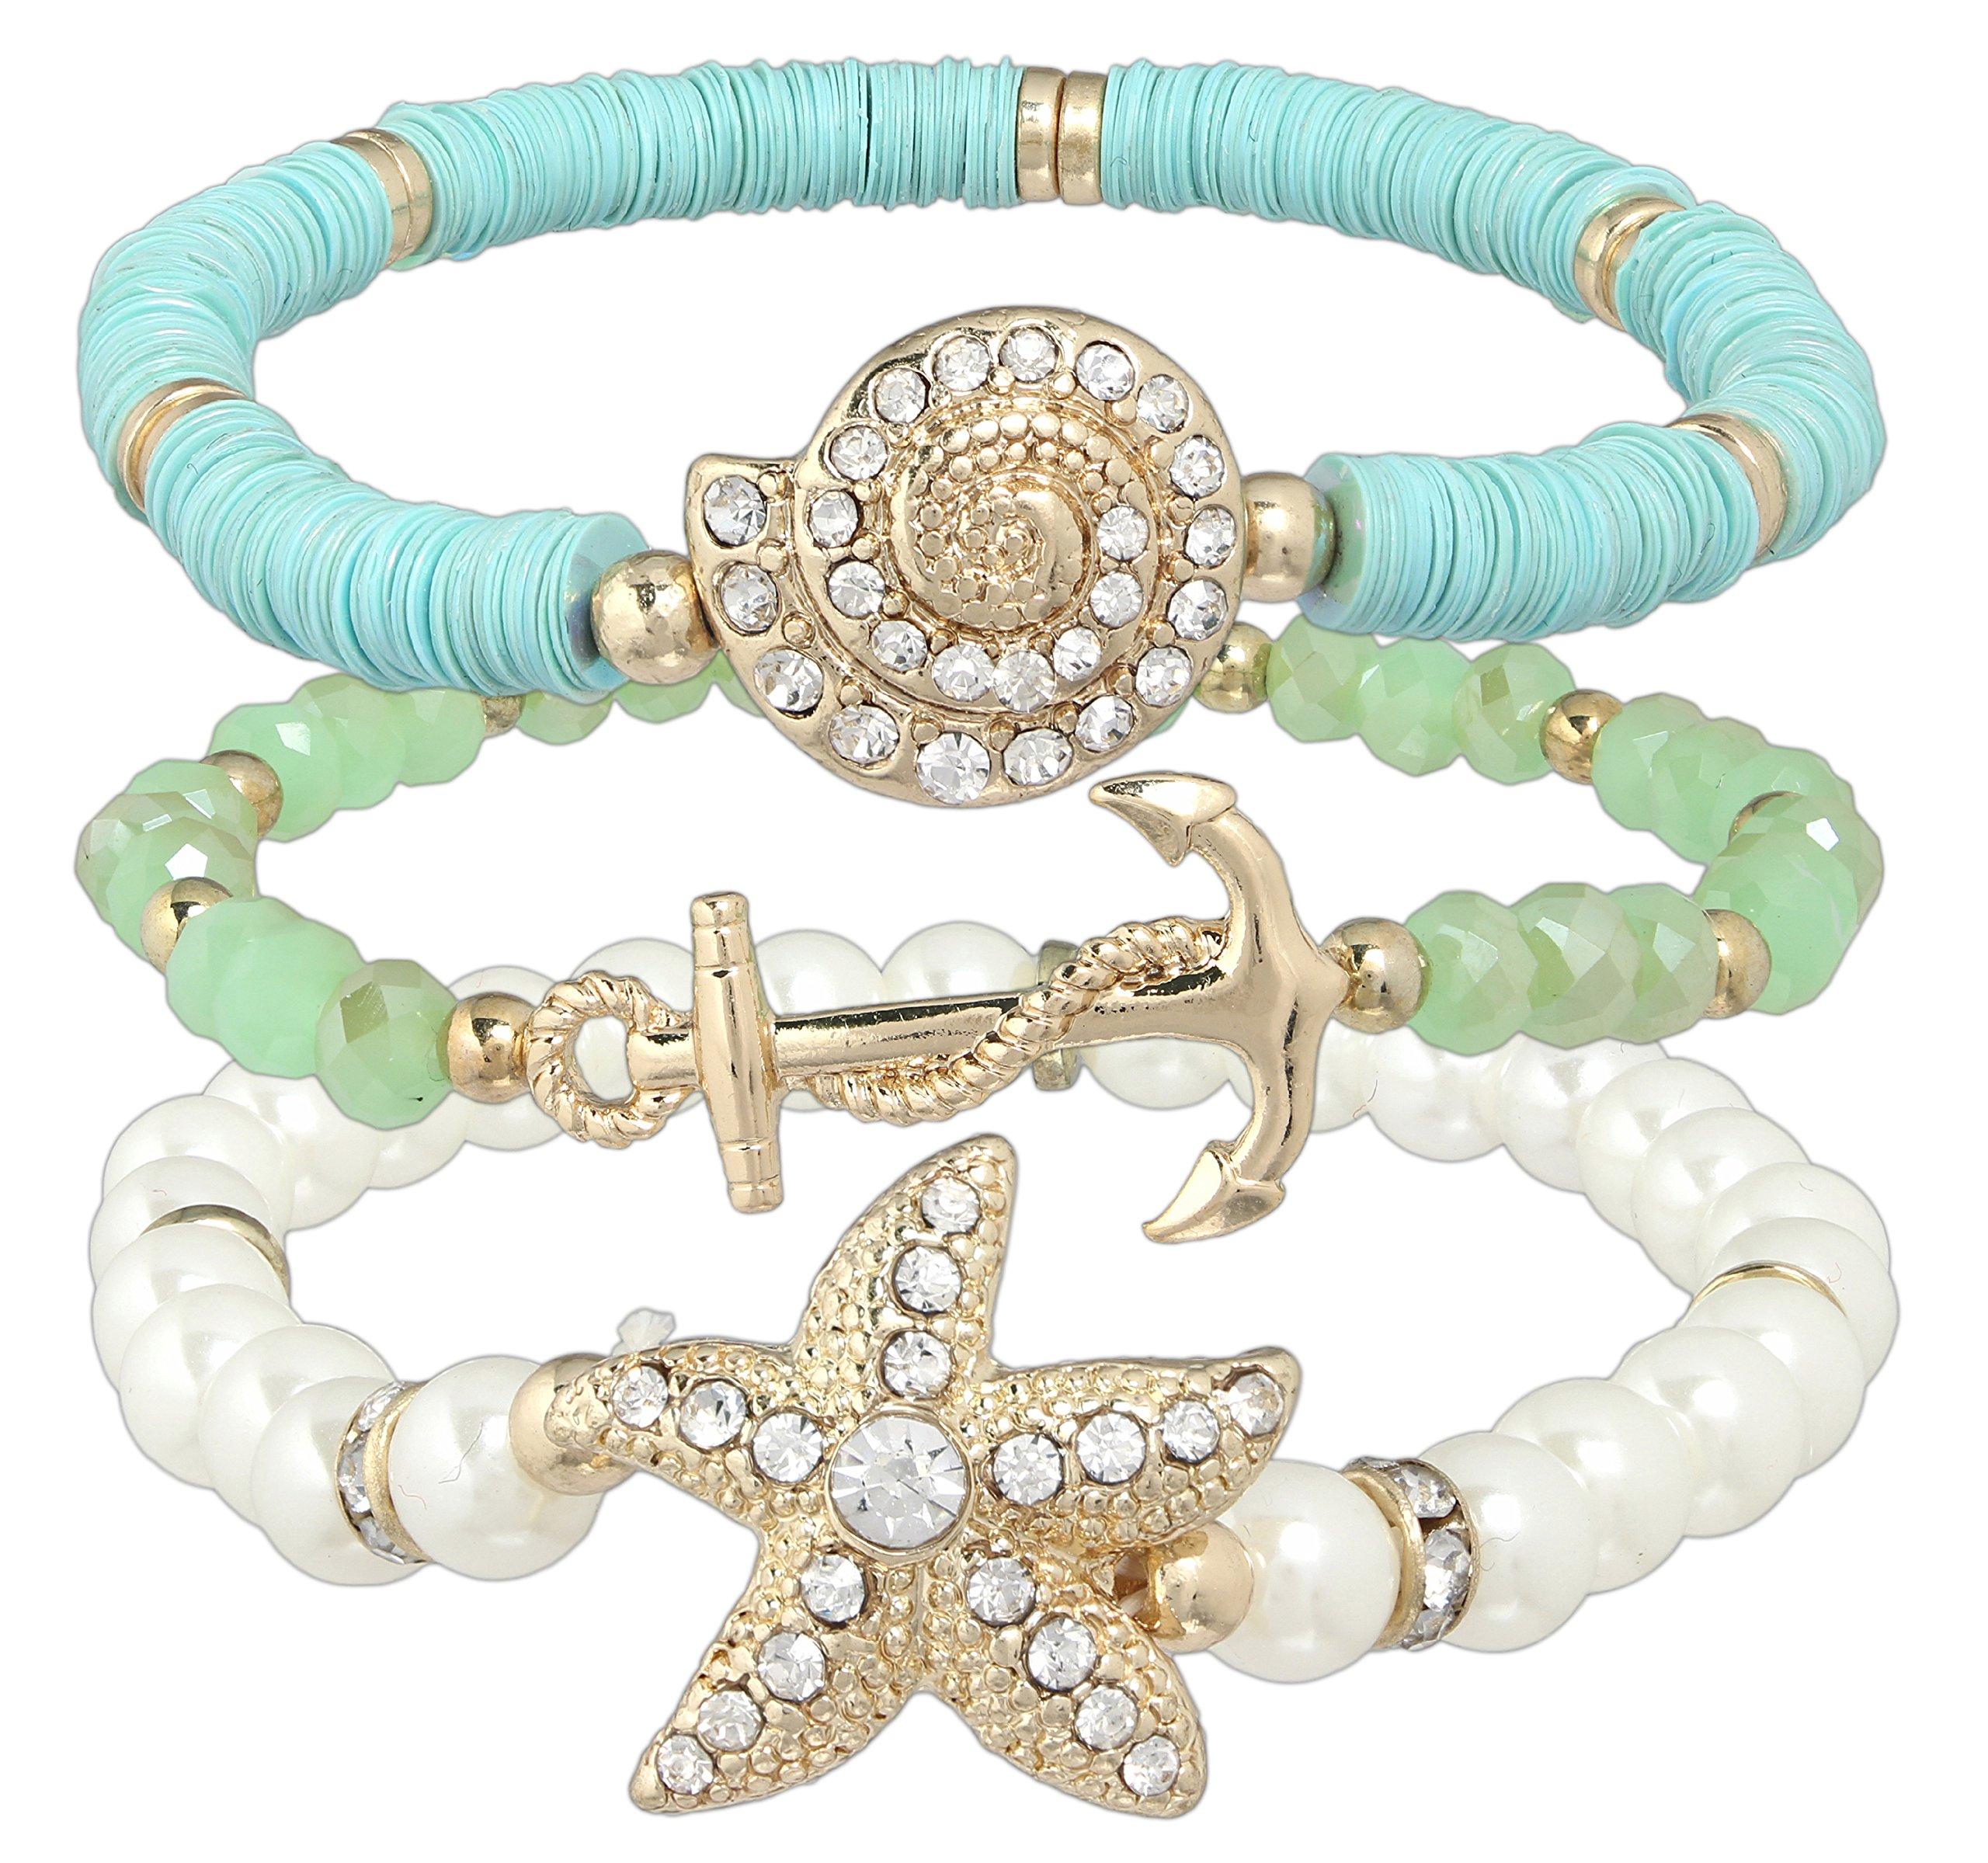 Rain 3 Piece Gold-plated Nautical Stretch Bracelet Set